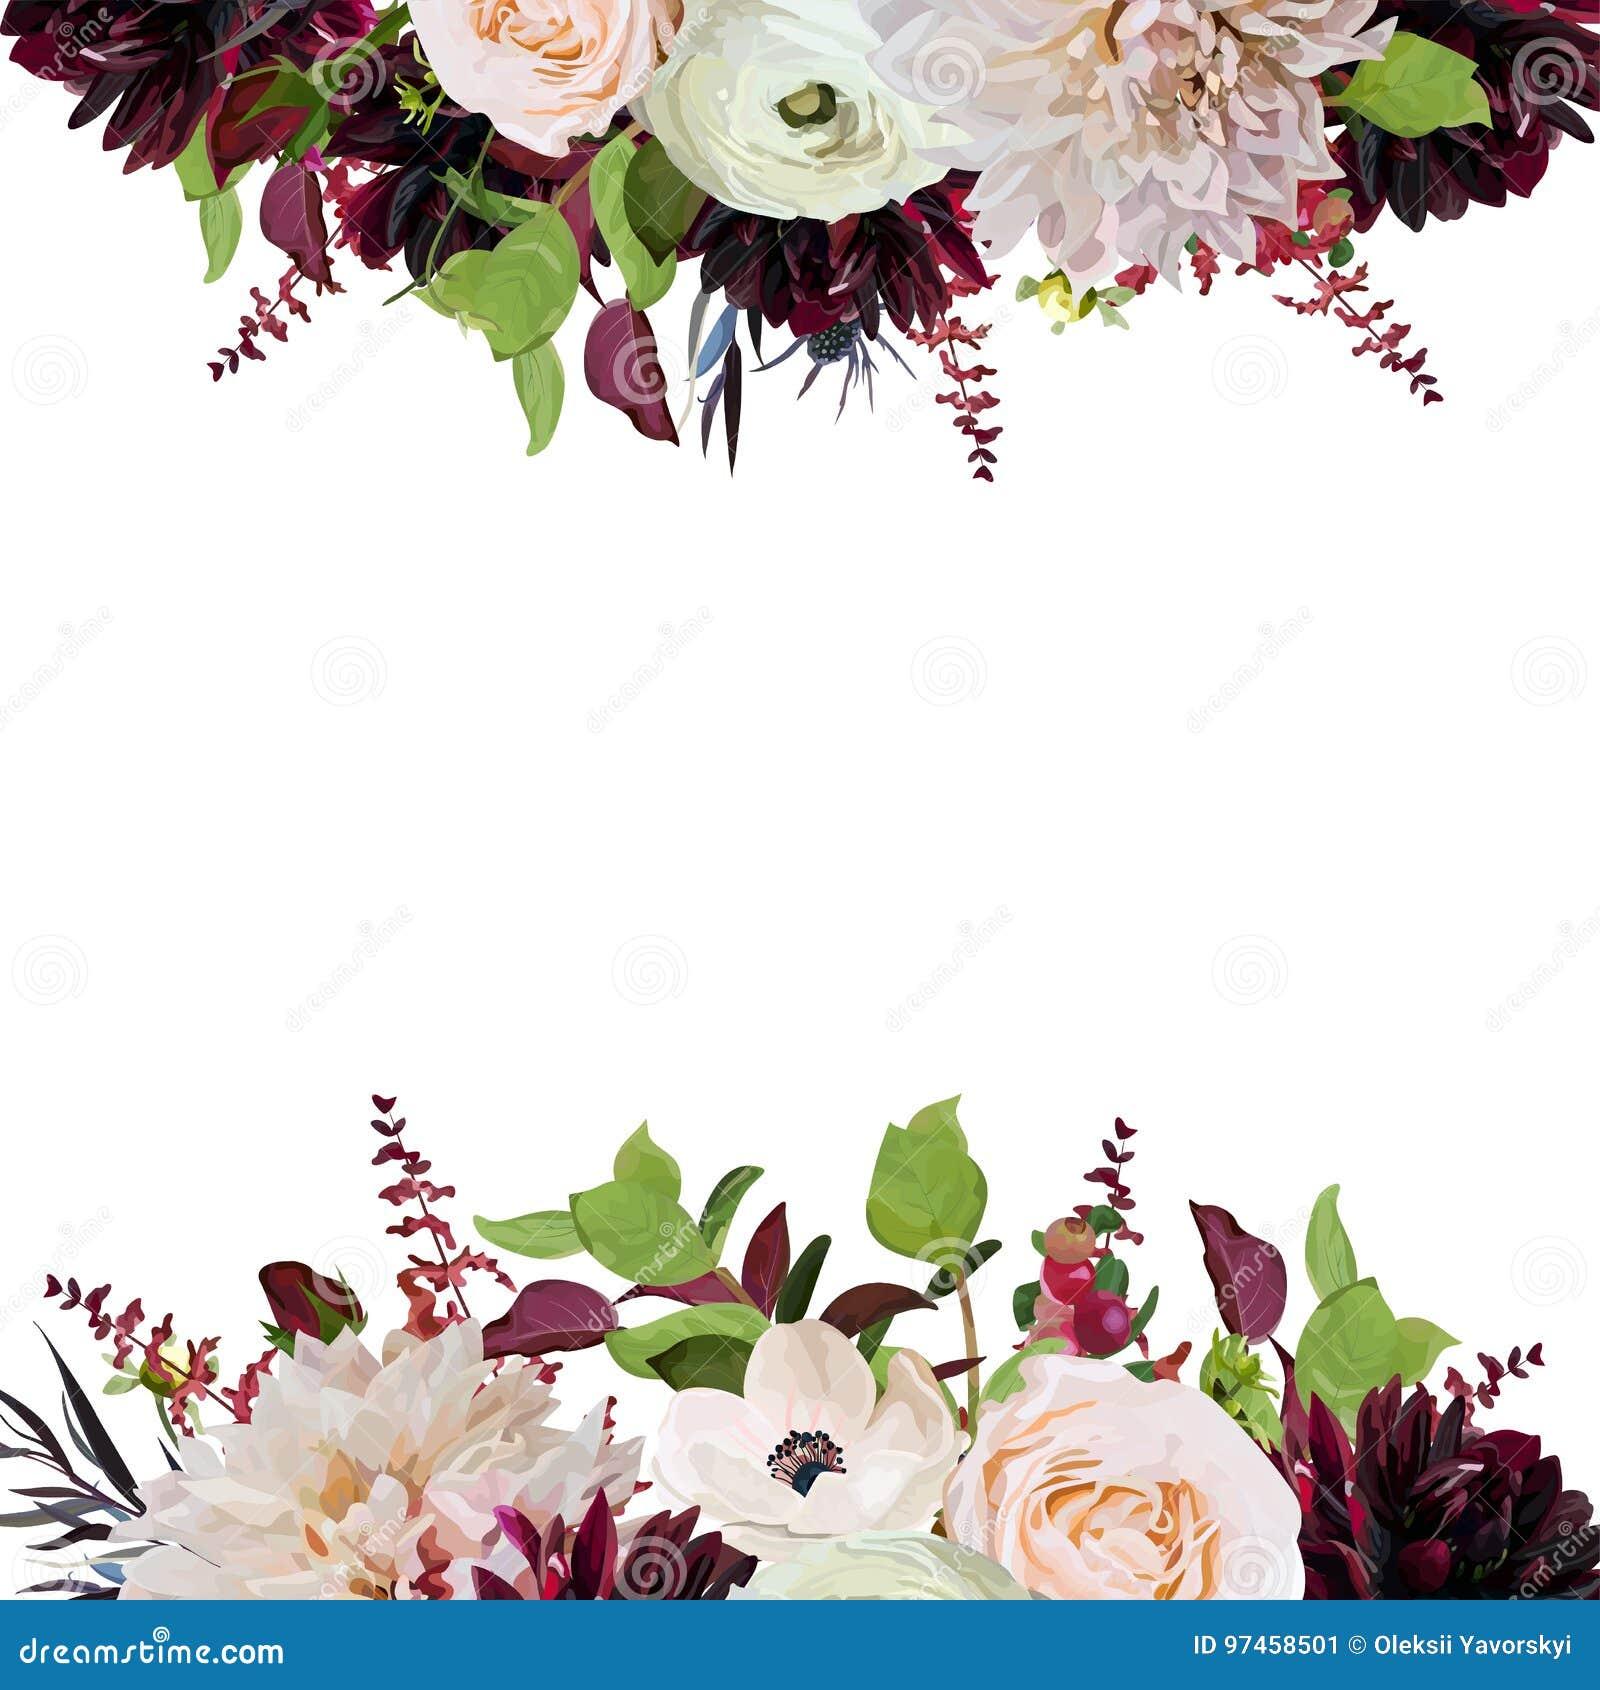 Vector floral design square card design pink Rose burgundy Dahlia flowers Anemone red Astilbe Agonis green garden leaves Wedding